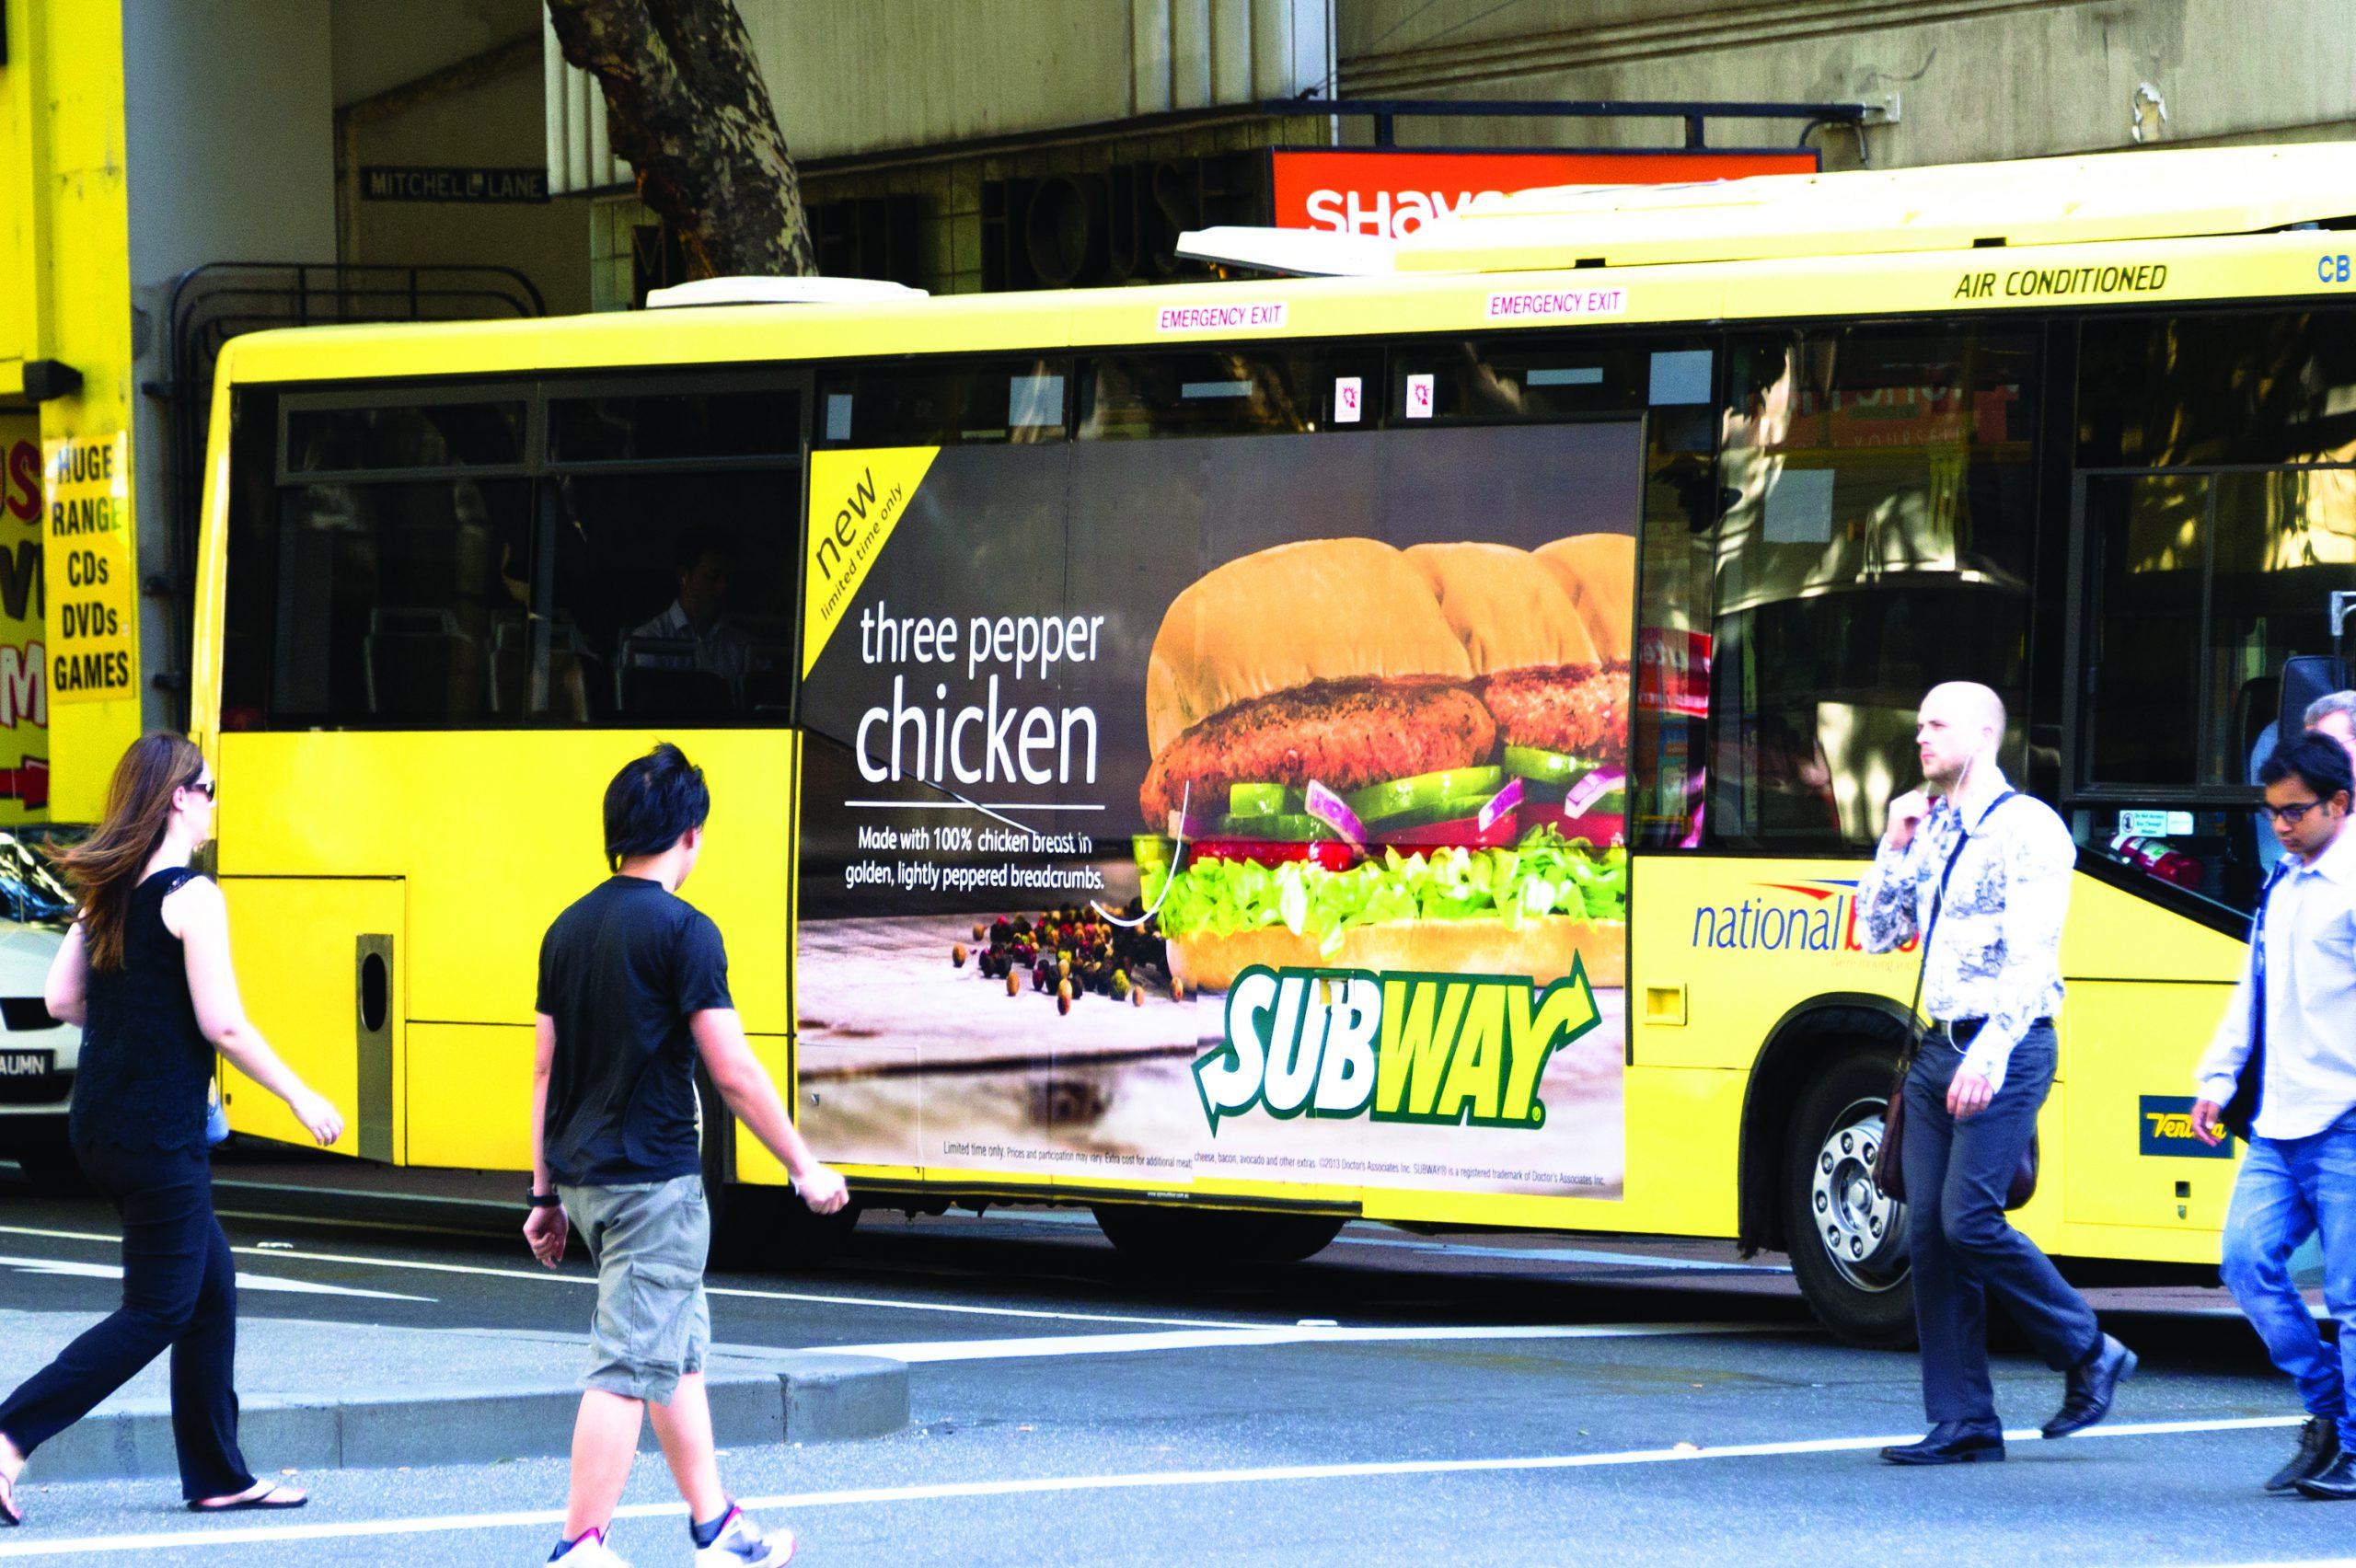 Subway Bus Window Advertisement Using Contra Vision